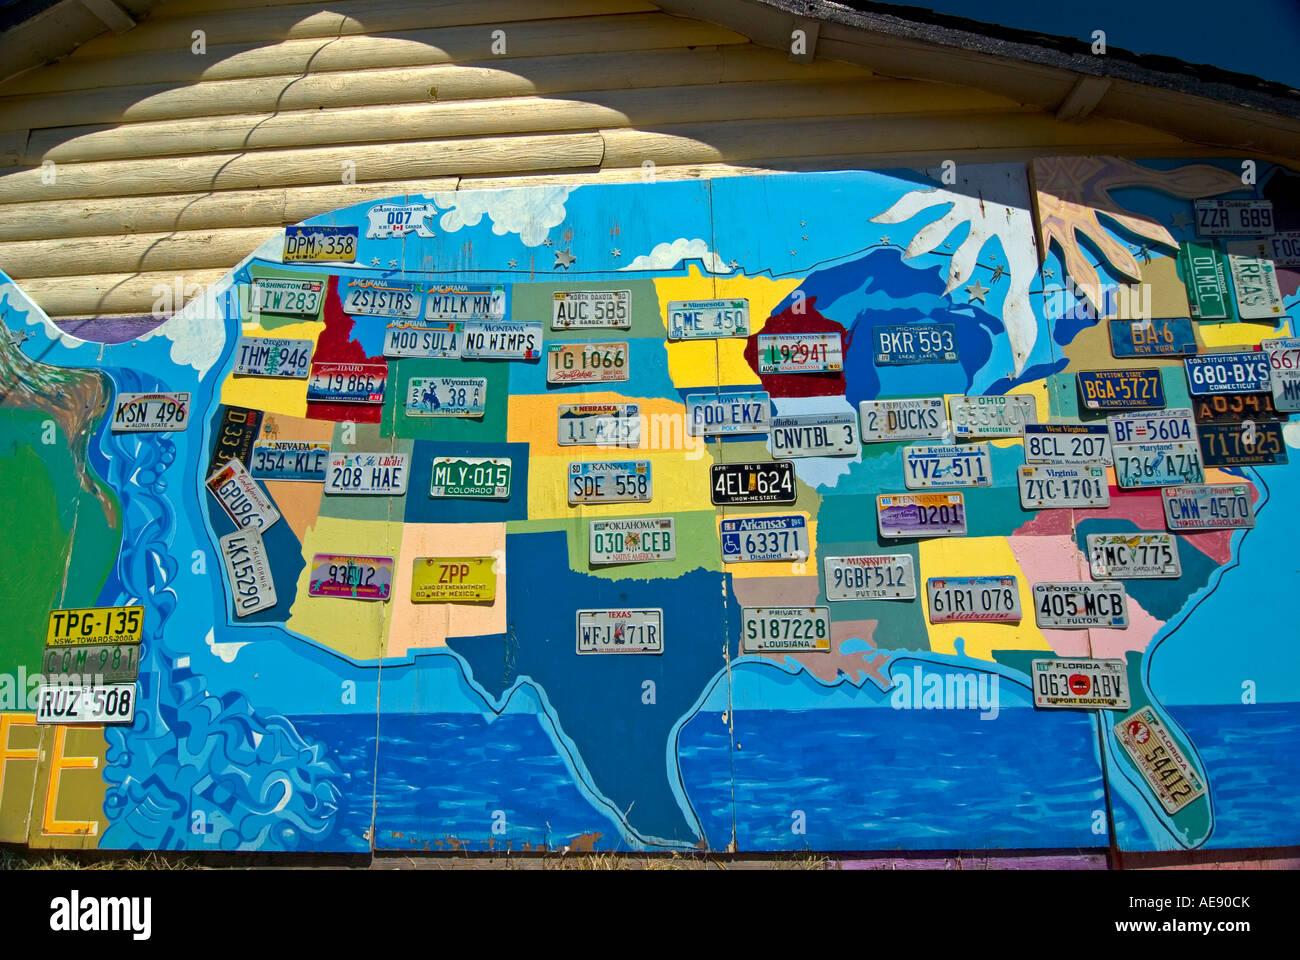 Map Usa State License Plates Stockfotos & Map Usa State ...